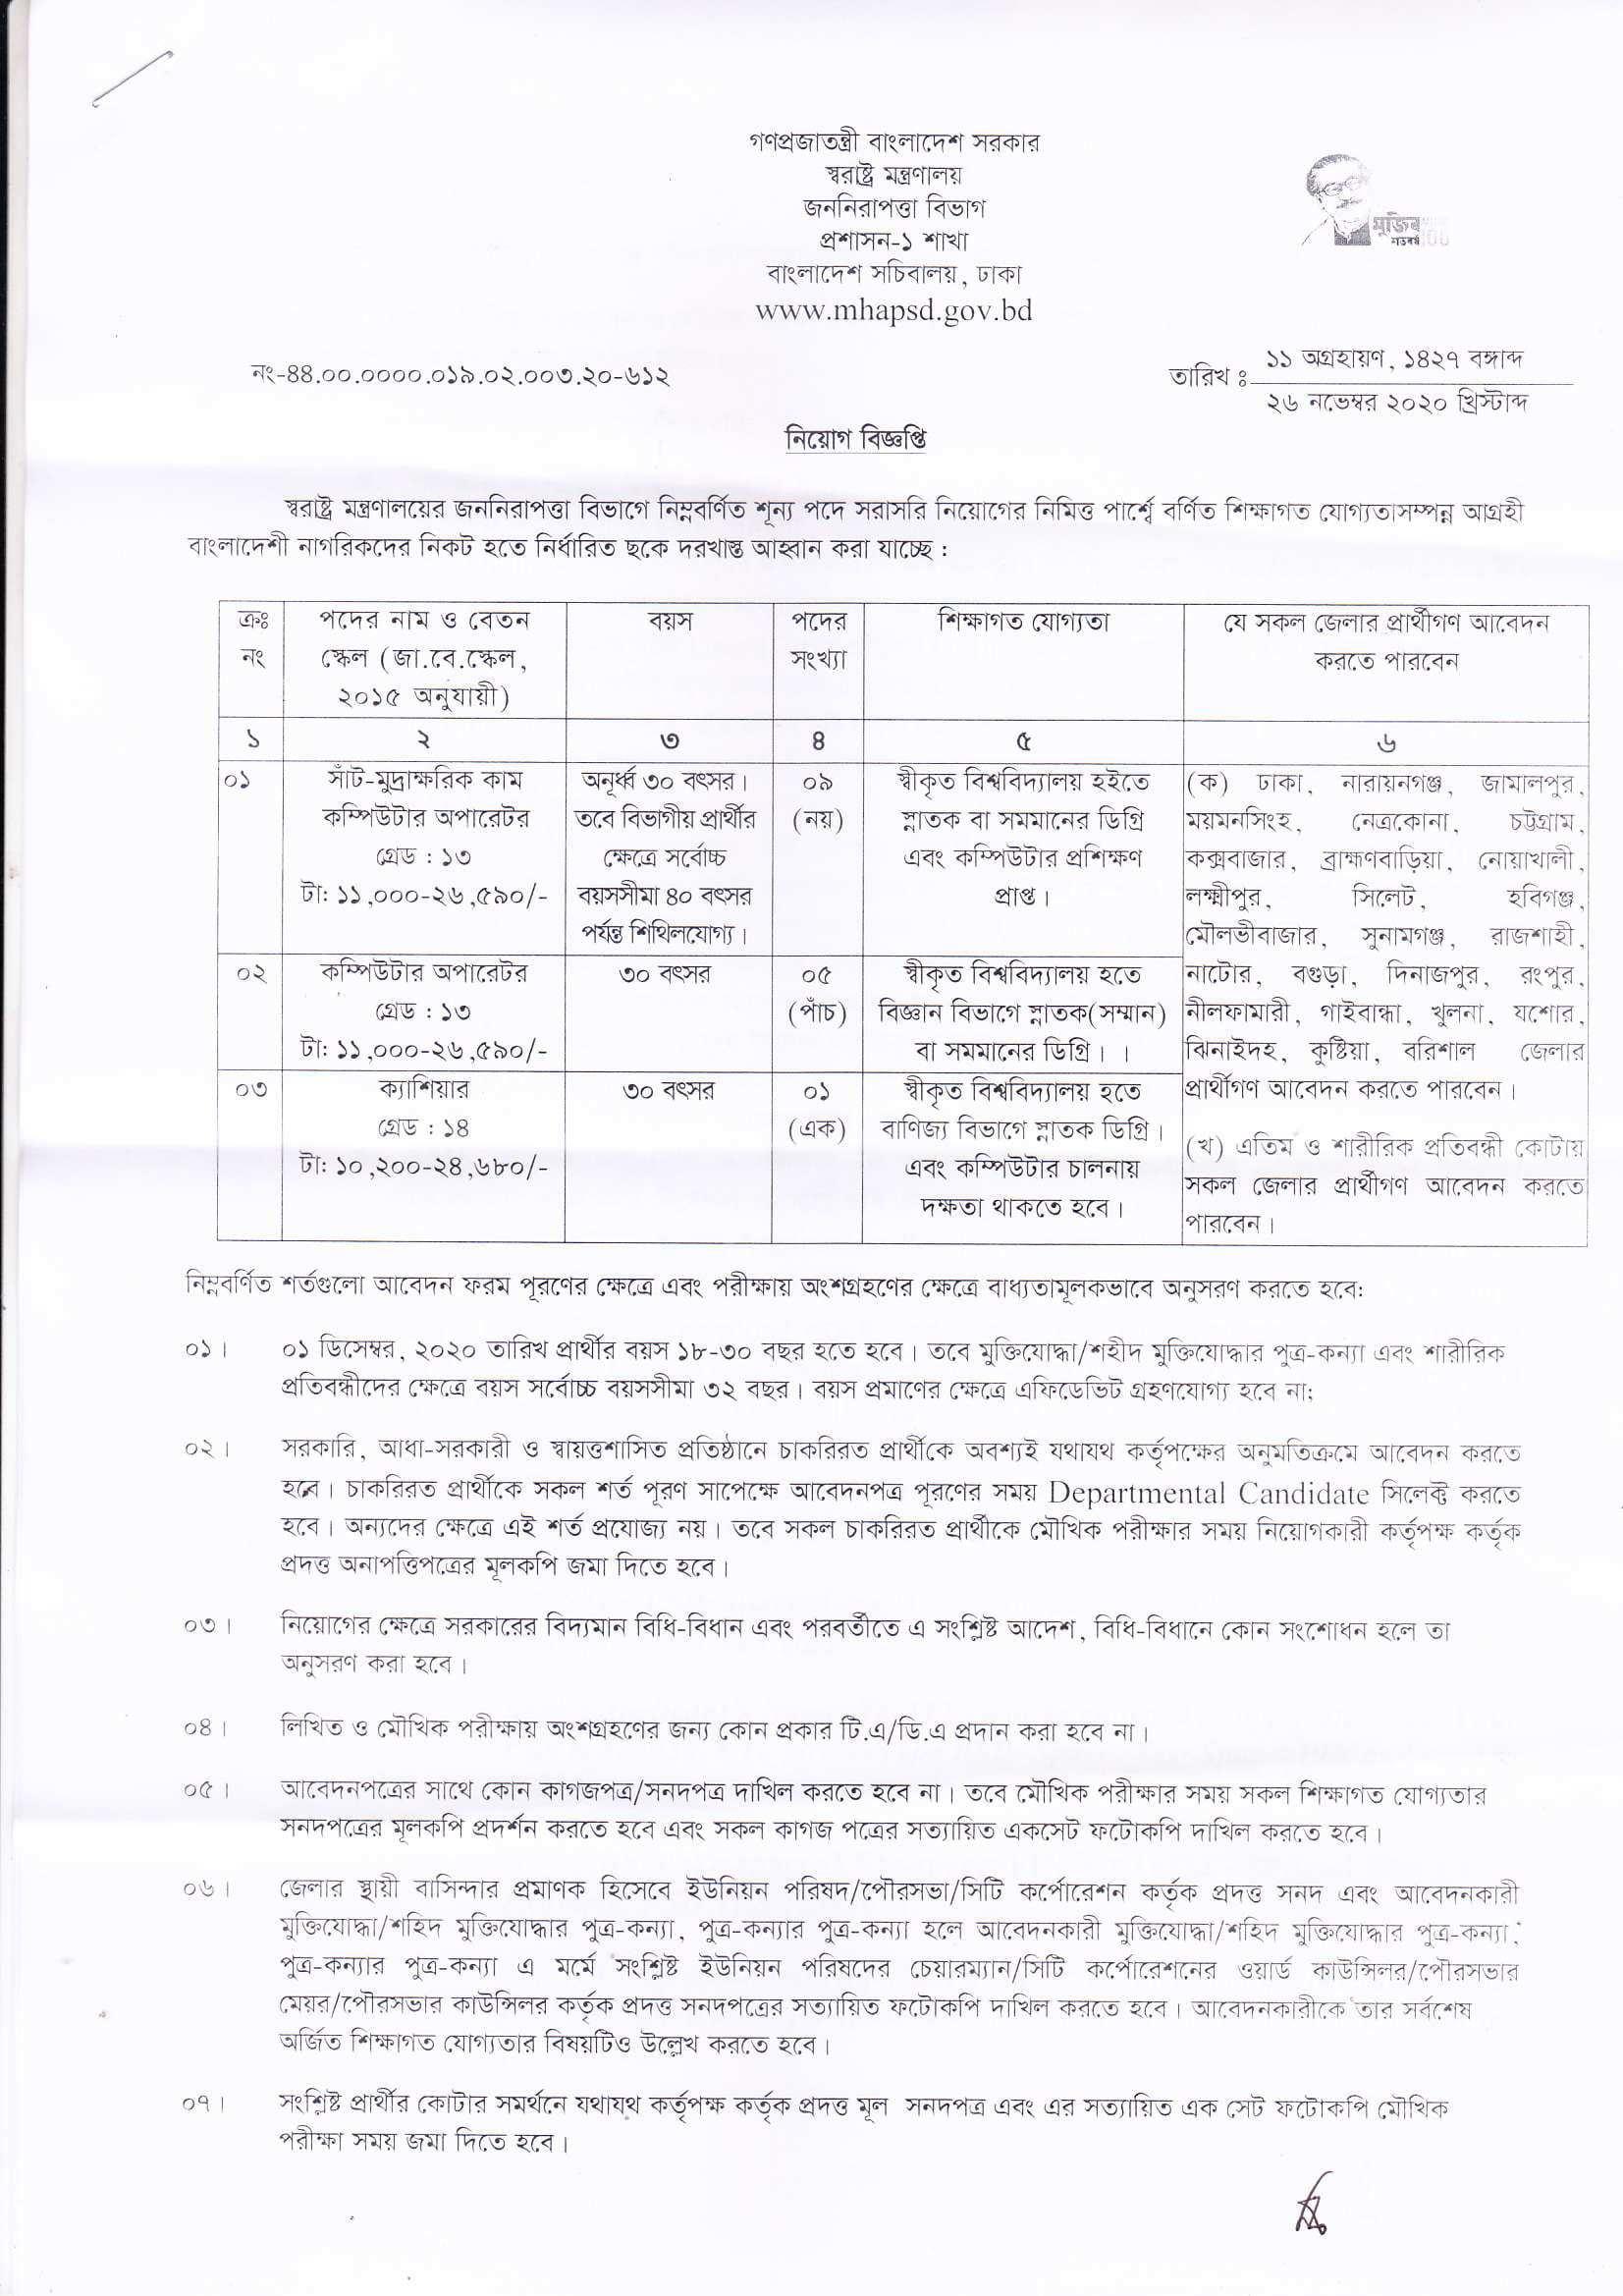 Ministry of Home Affairs Job Circular 2020